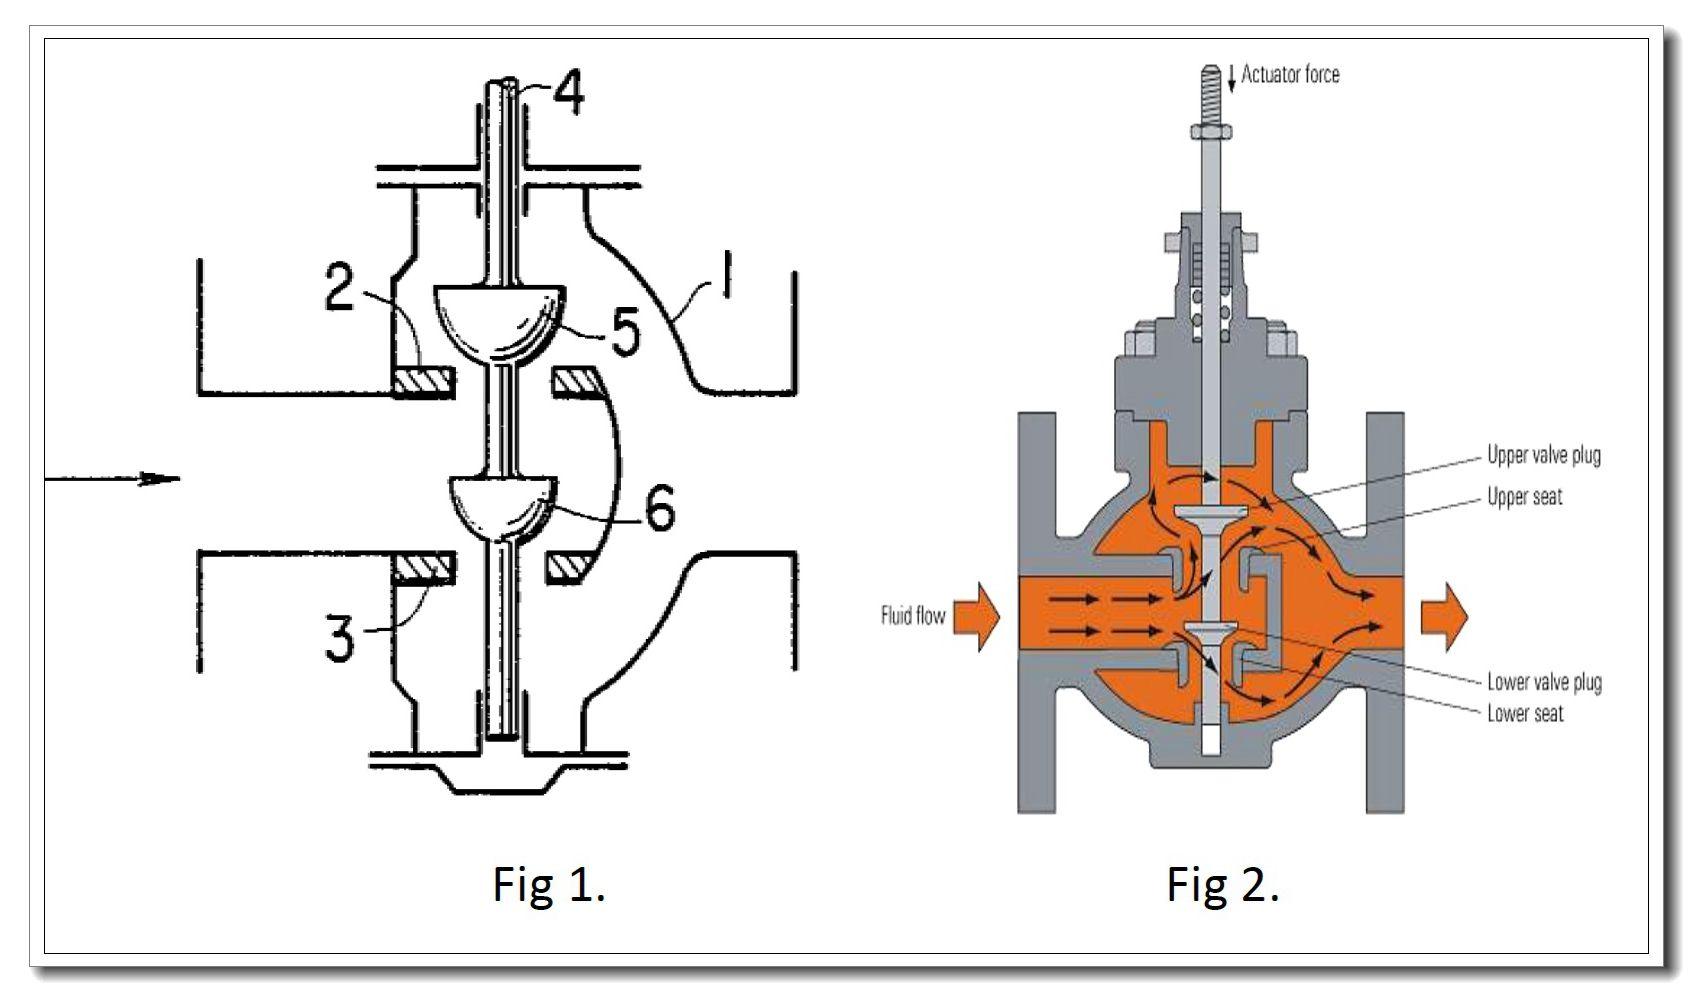 double valve diagram wiring diagram new double acting solenoid valve diagram double seat gate valve sjd susan [ 1693 x 992 Pixel ]